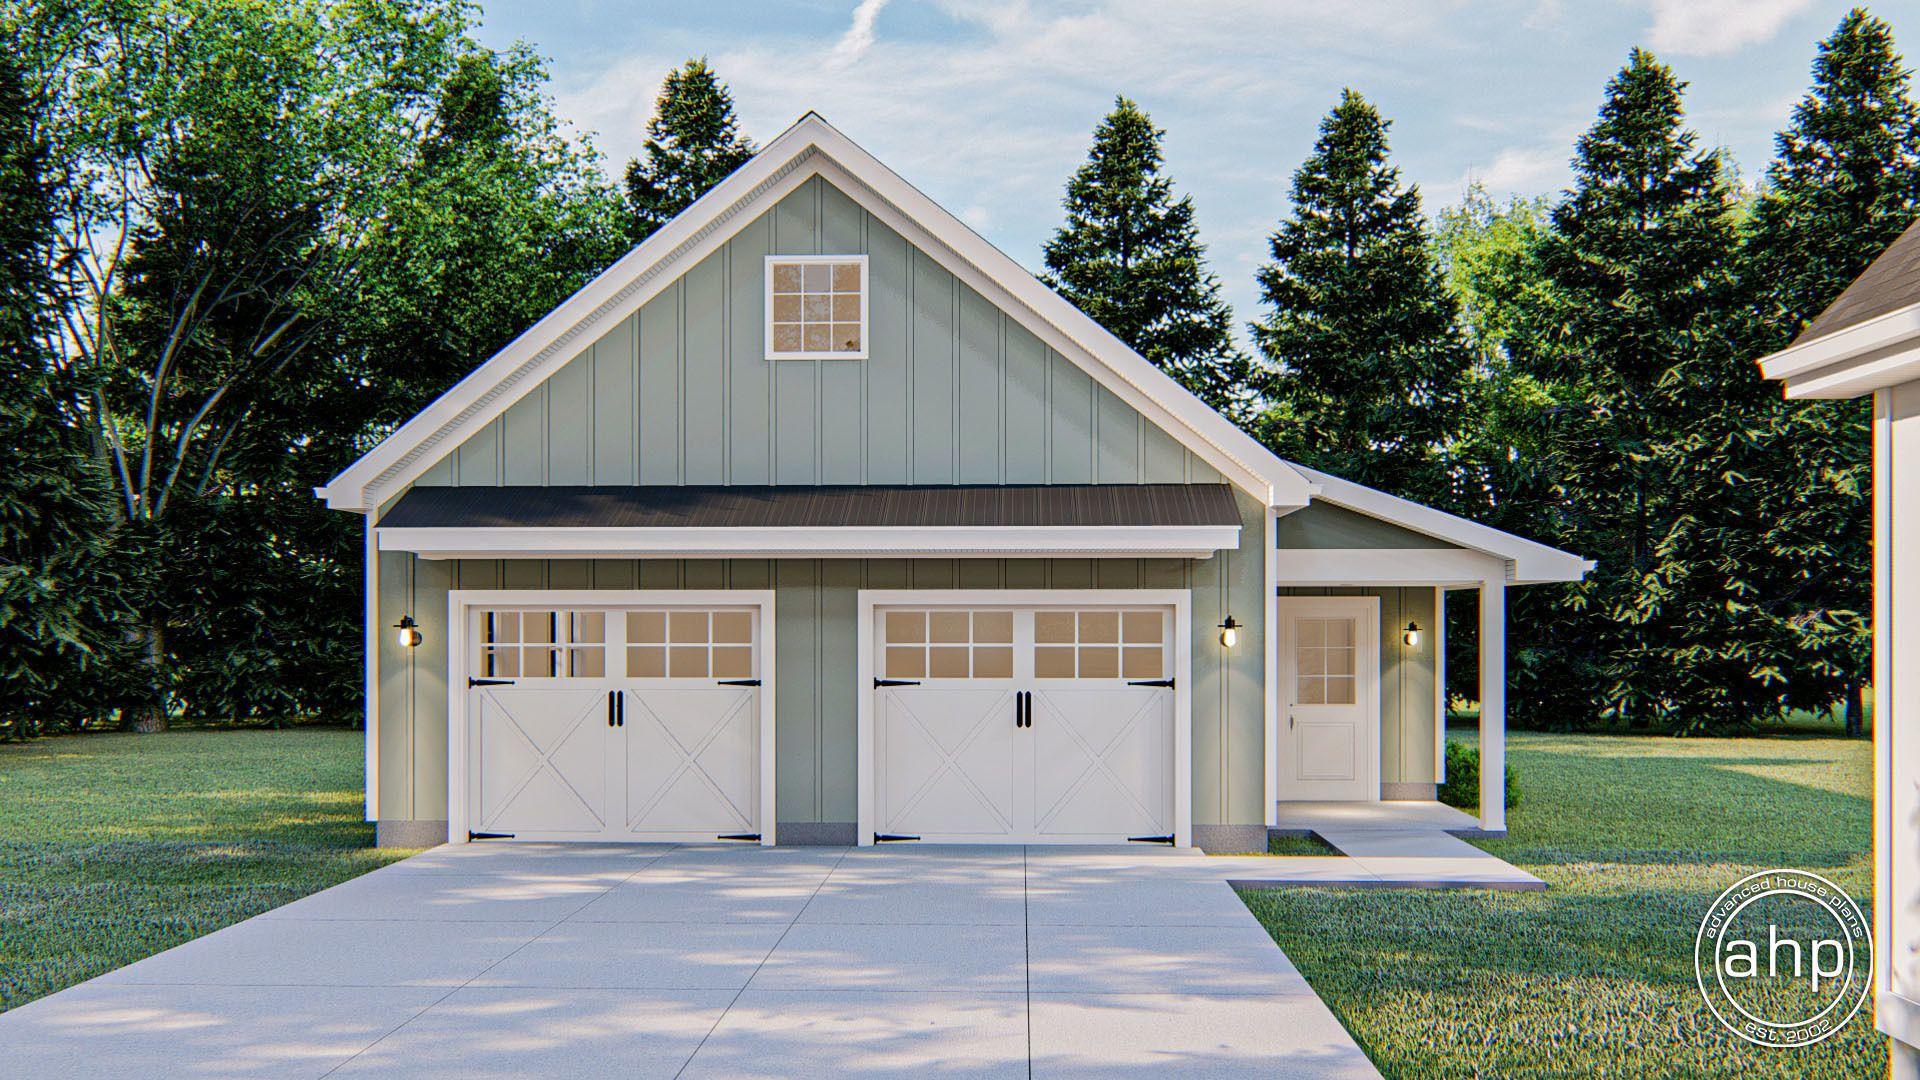 Modern Farmhouse Garage Plan Adkins In 2020 Farmhouse Garage Modern Farmhouse Garage Plans Detached